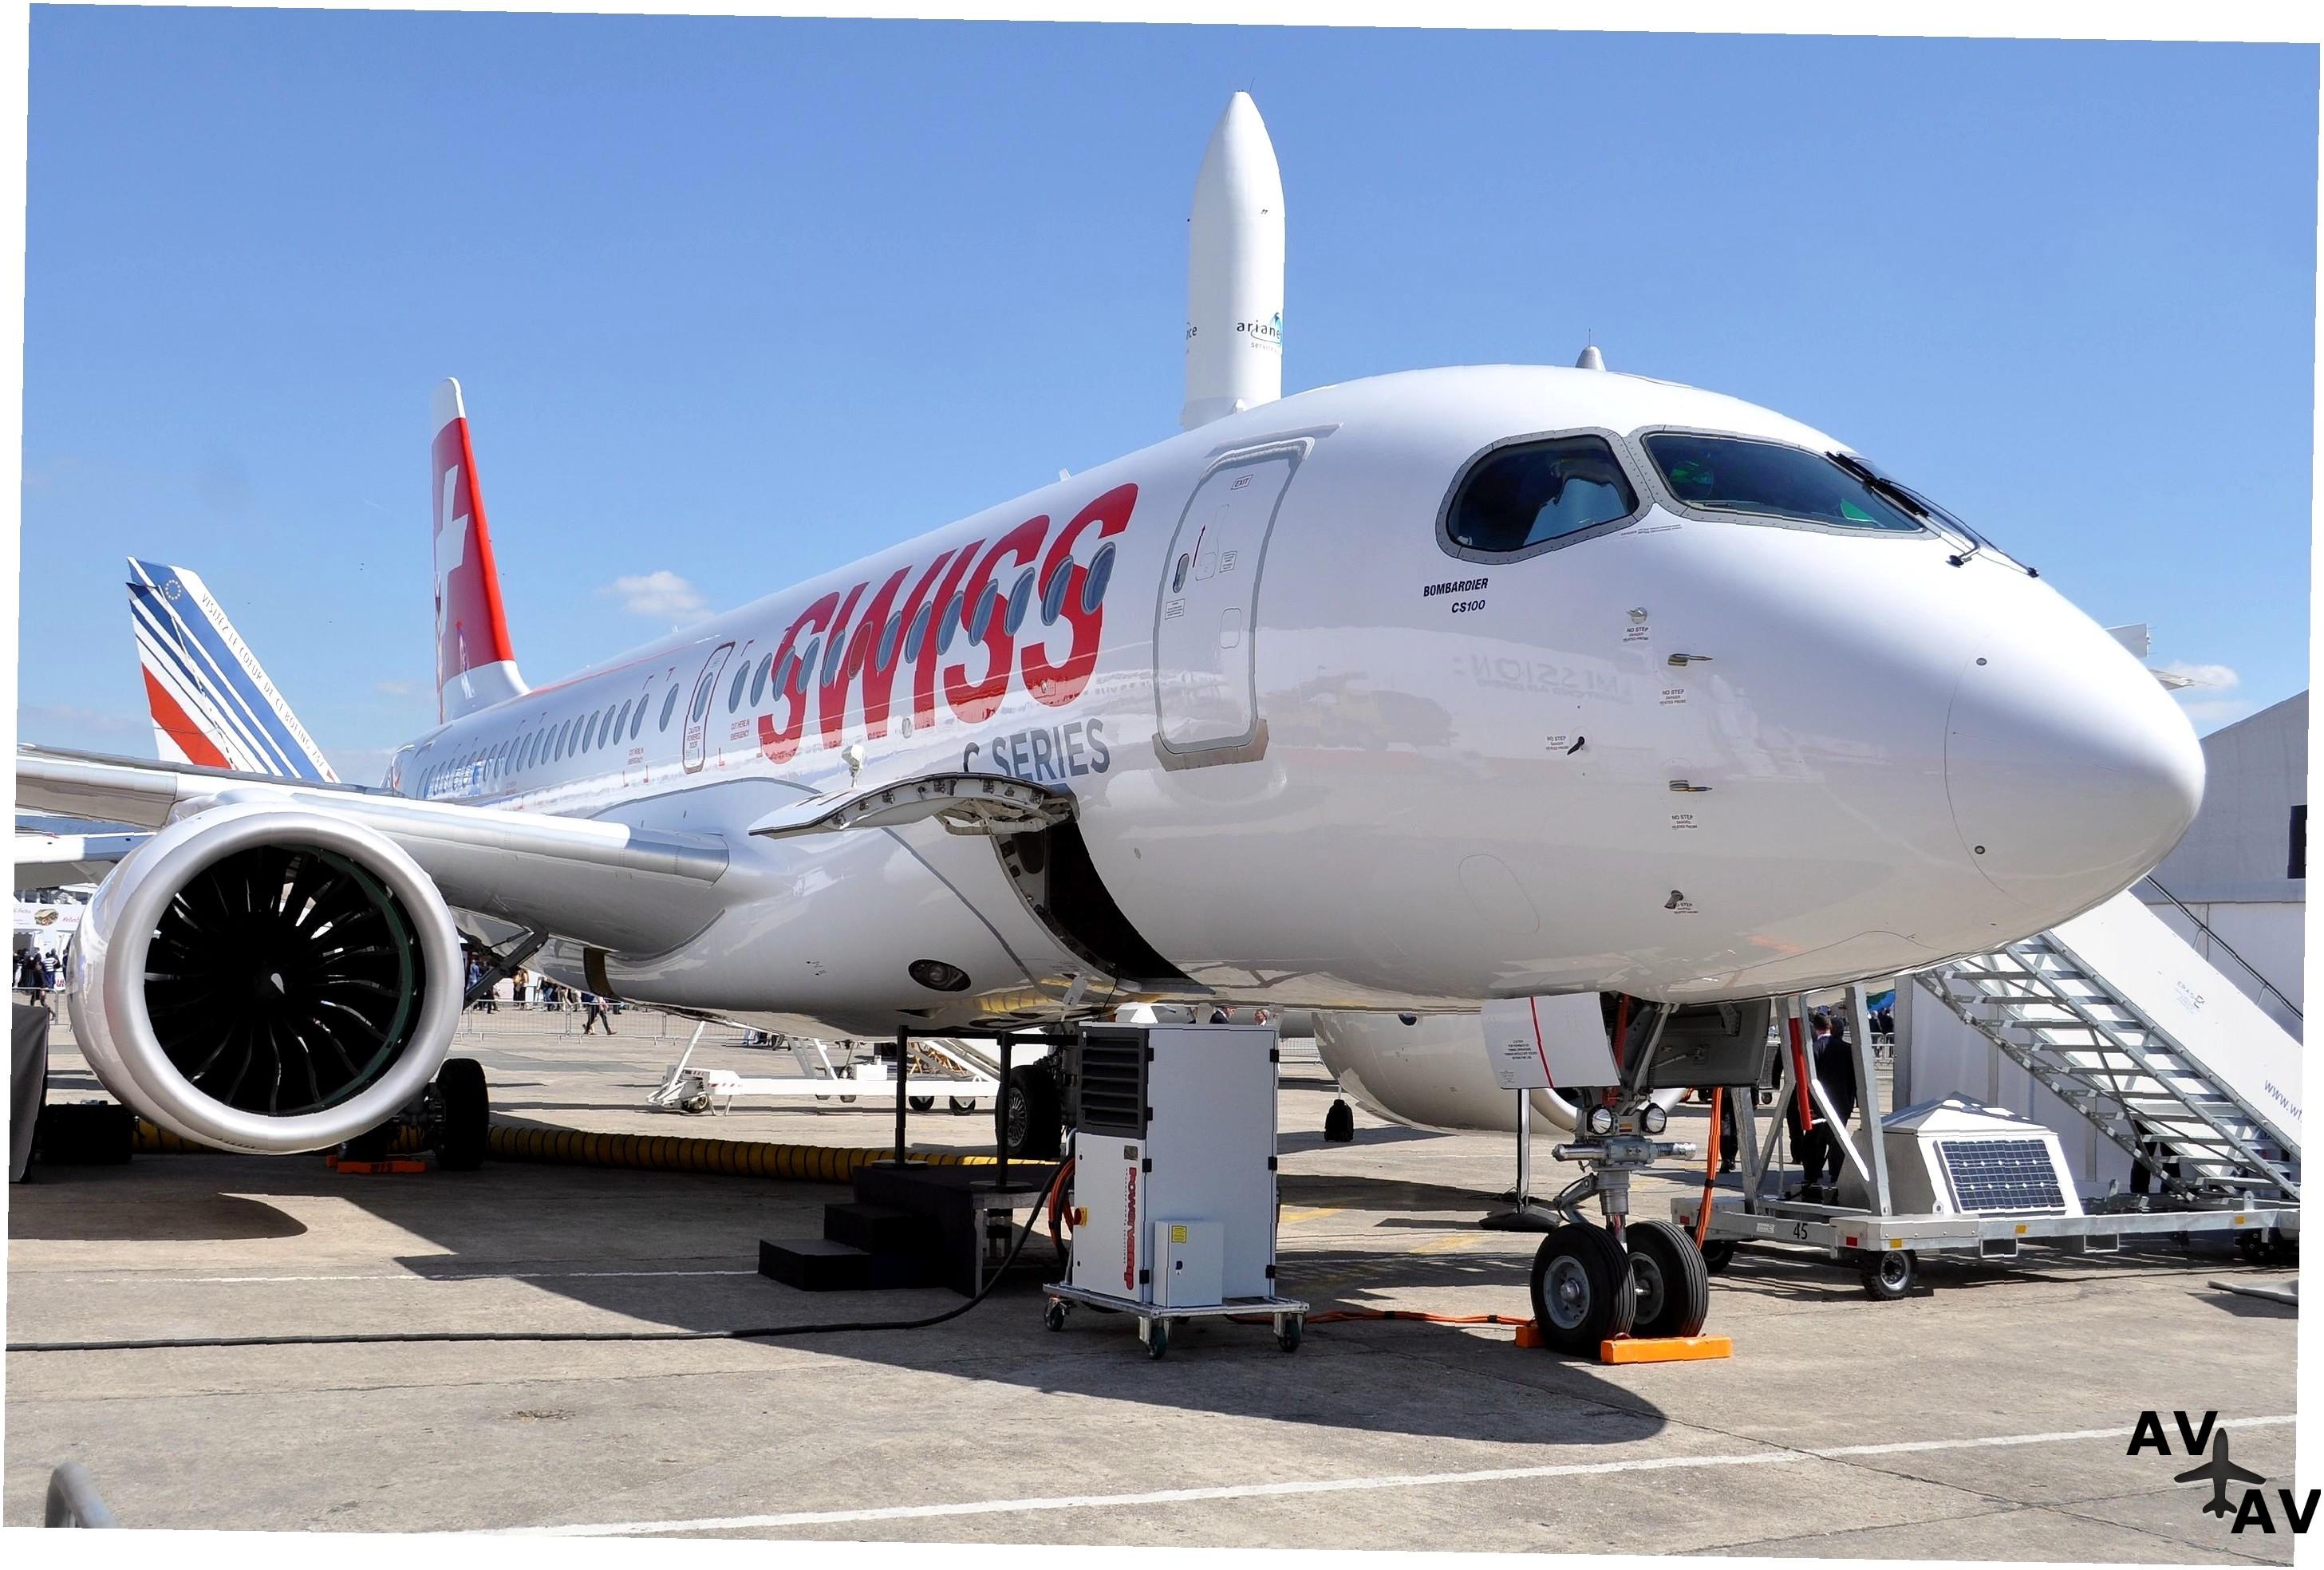 Аэропорт Шатору-Сантр (Shute Harbour H/P) коды IATA: JHQ ICAO: YSHR город: Шатору-Сантр (Shute Harbour) страна: Австралия (Australia)